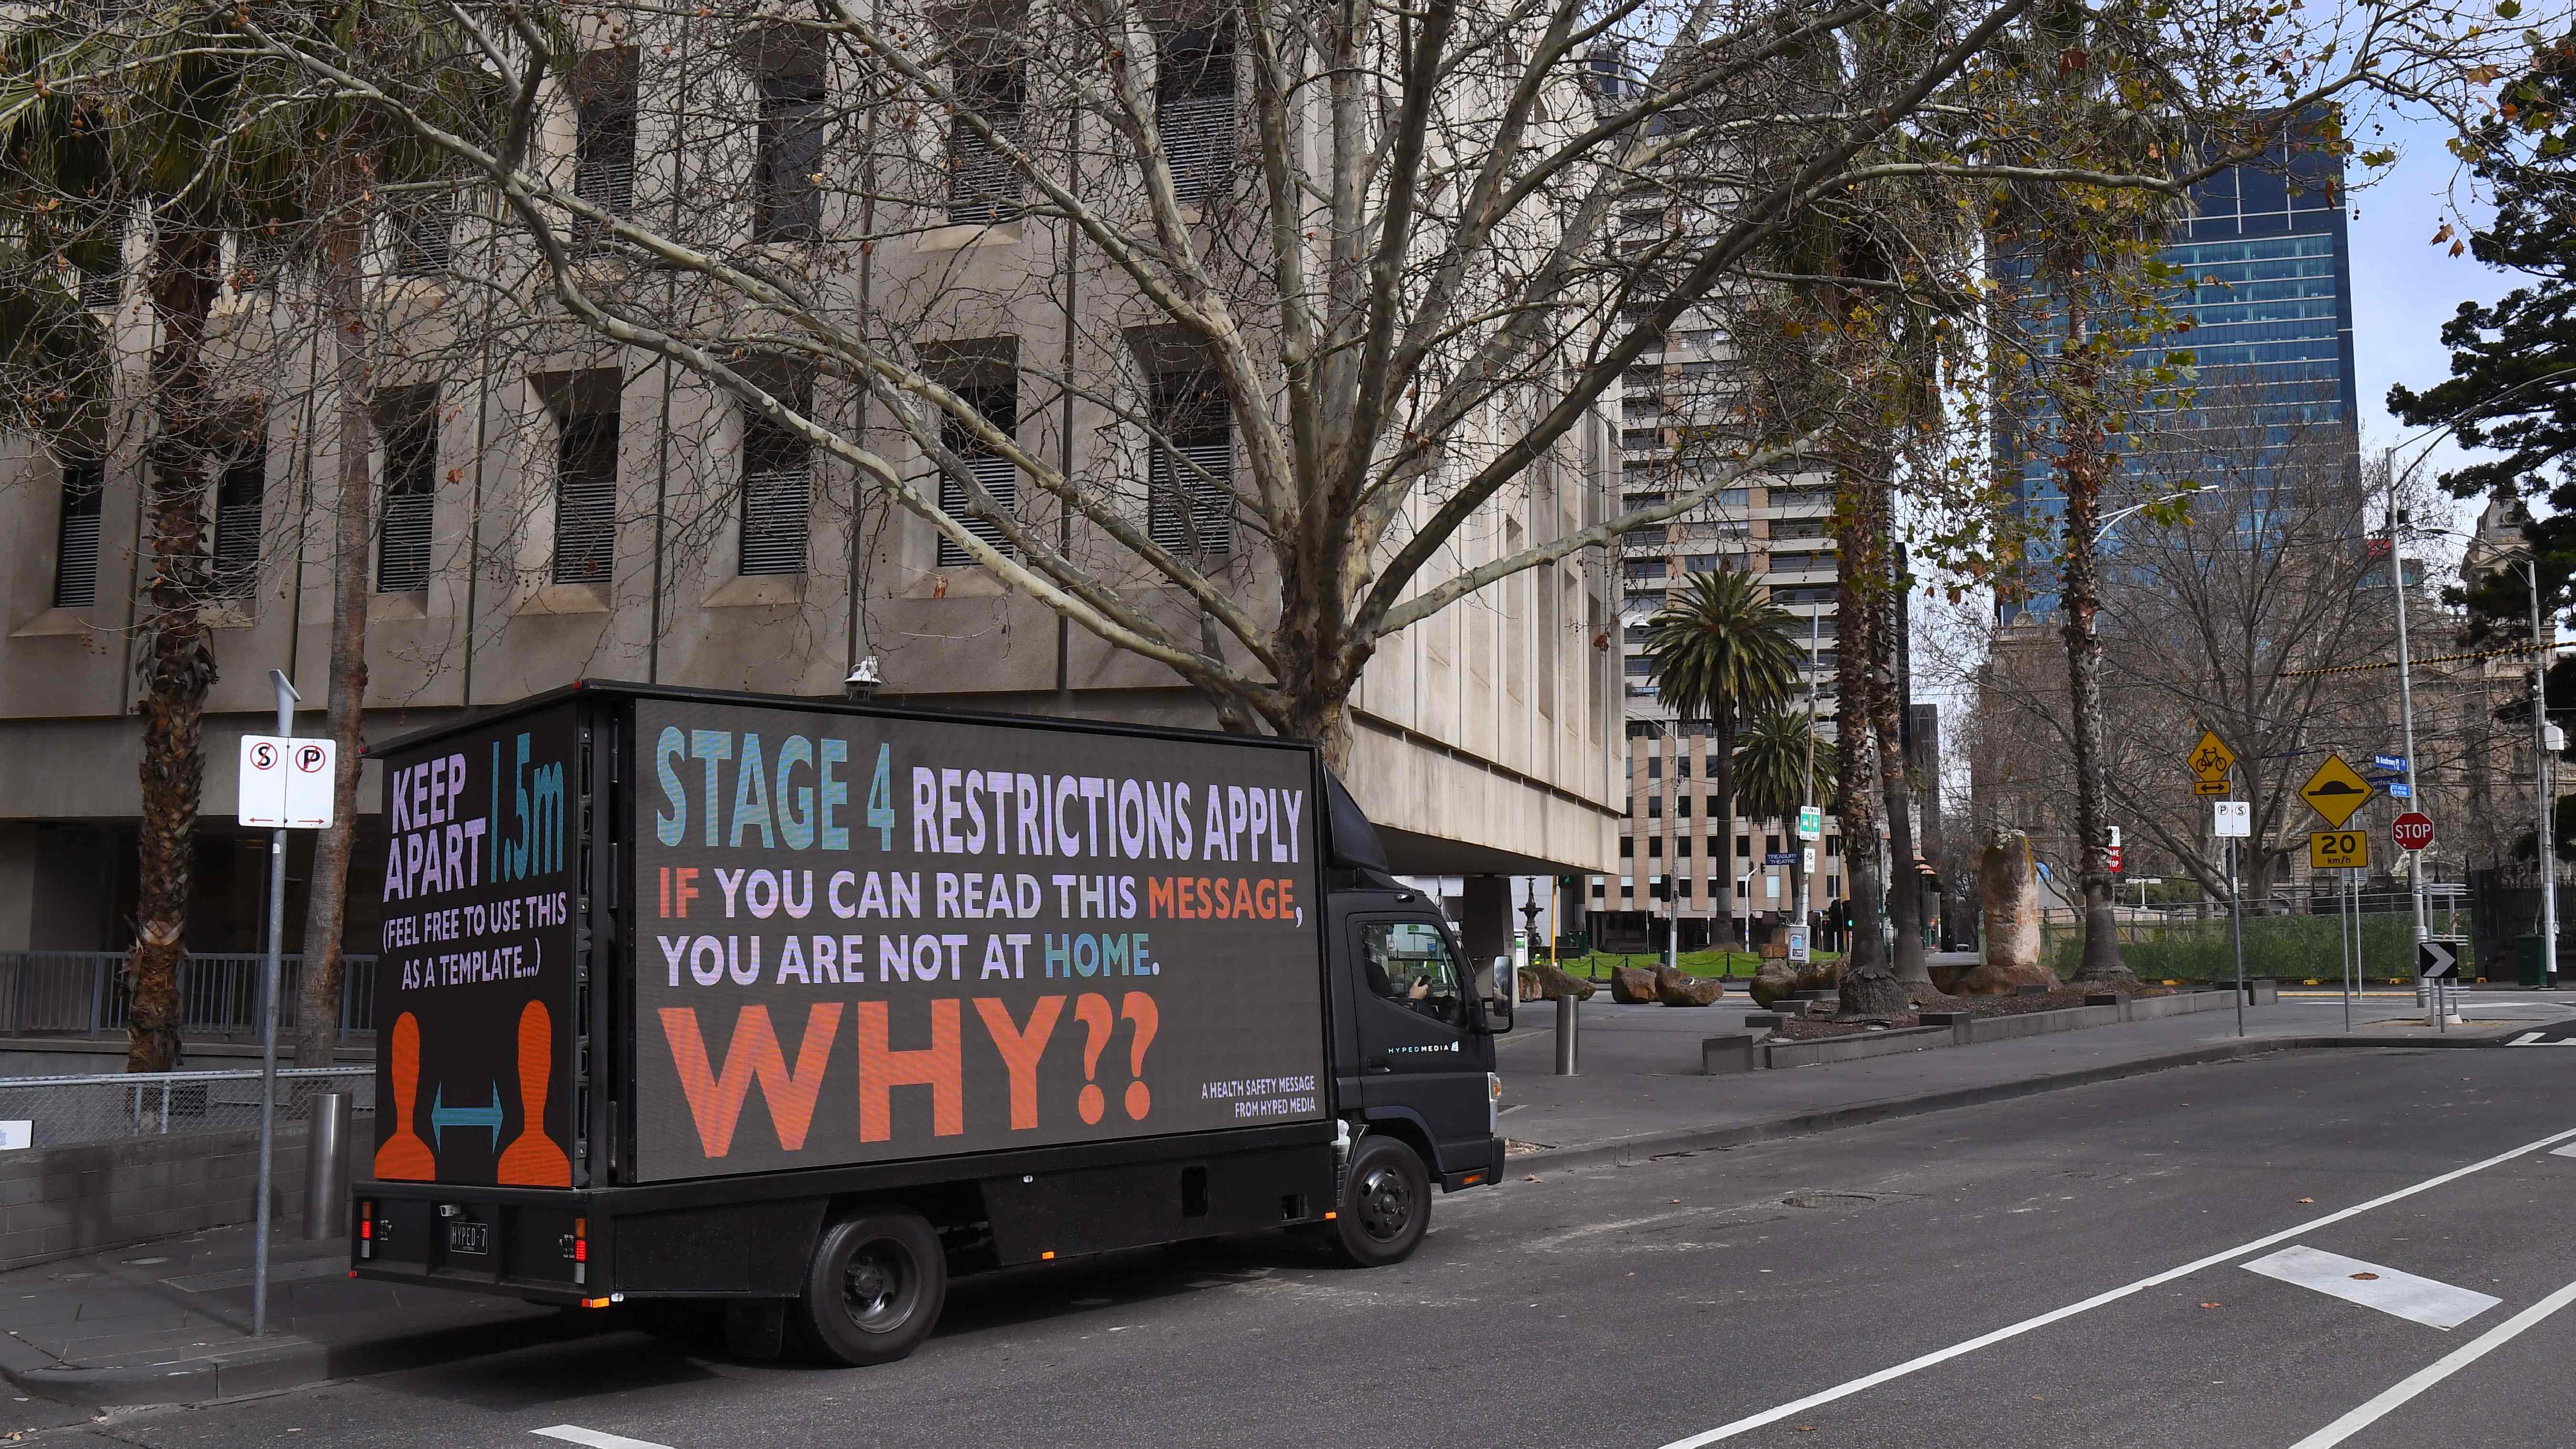 Australia S Melbourne Enters New Covid 19 Lockdown Economy Worsens Cgtn